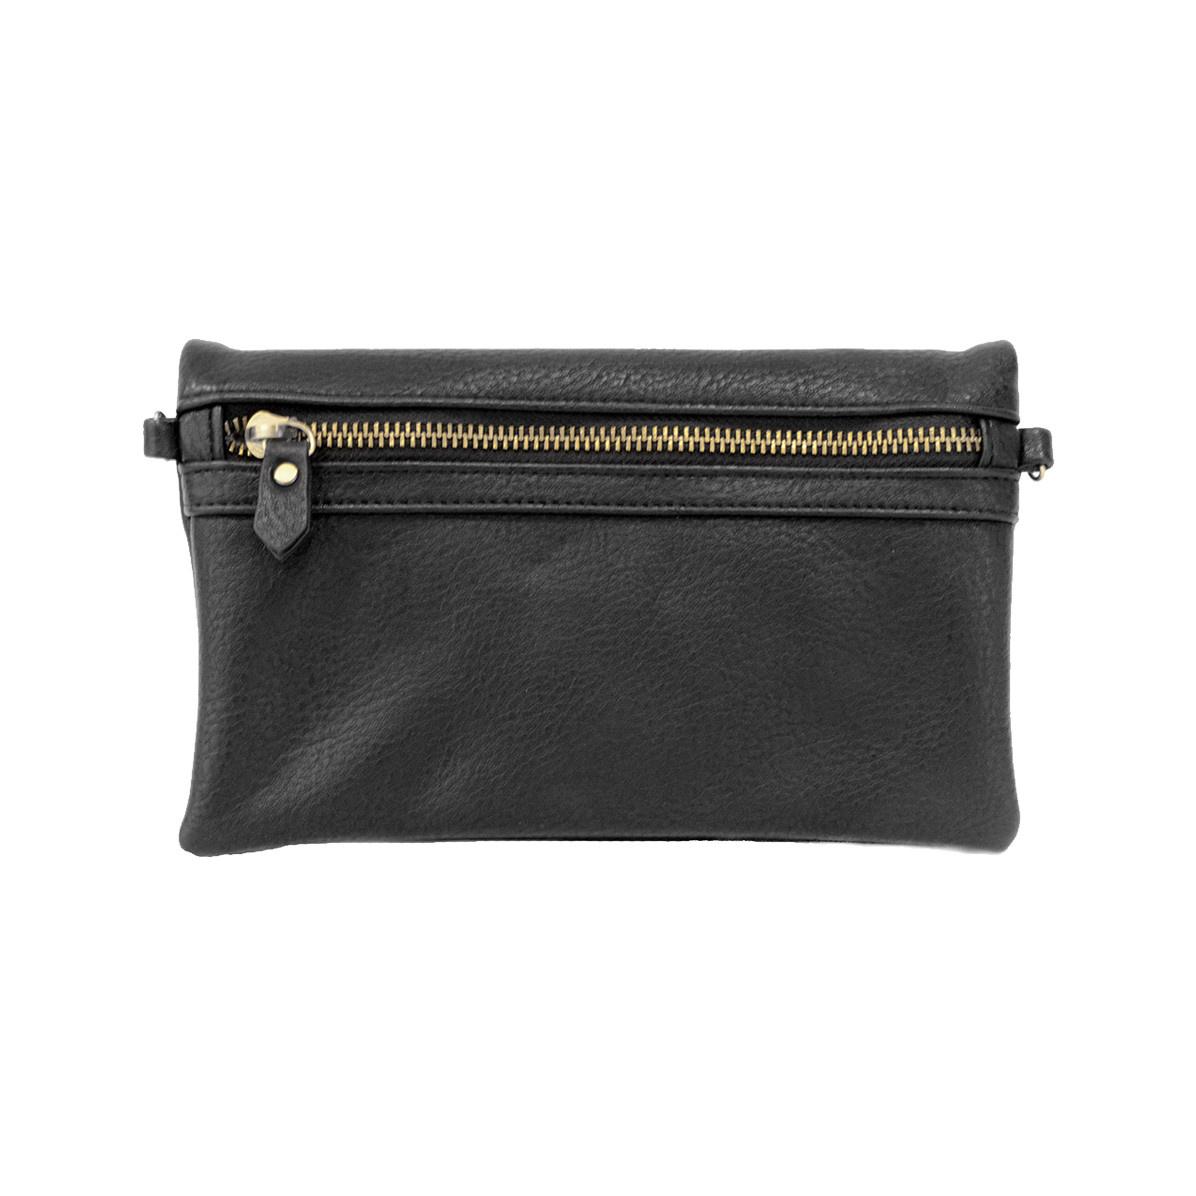 Joy Susan Joy Susan Kate Crossbody Handbag Black